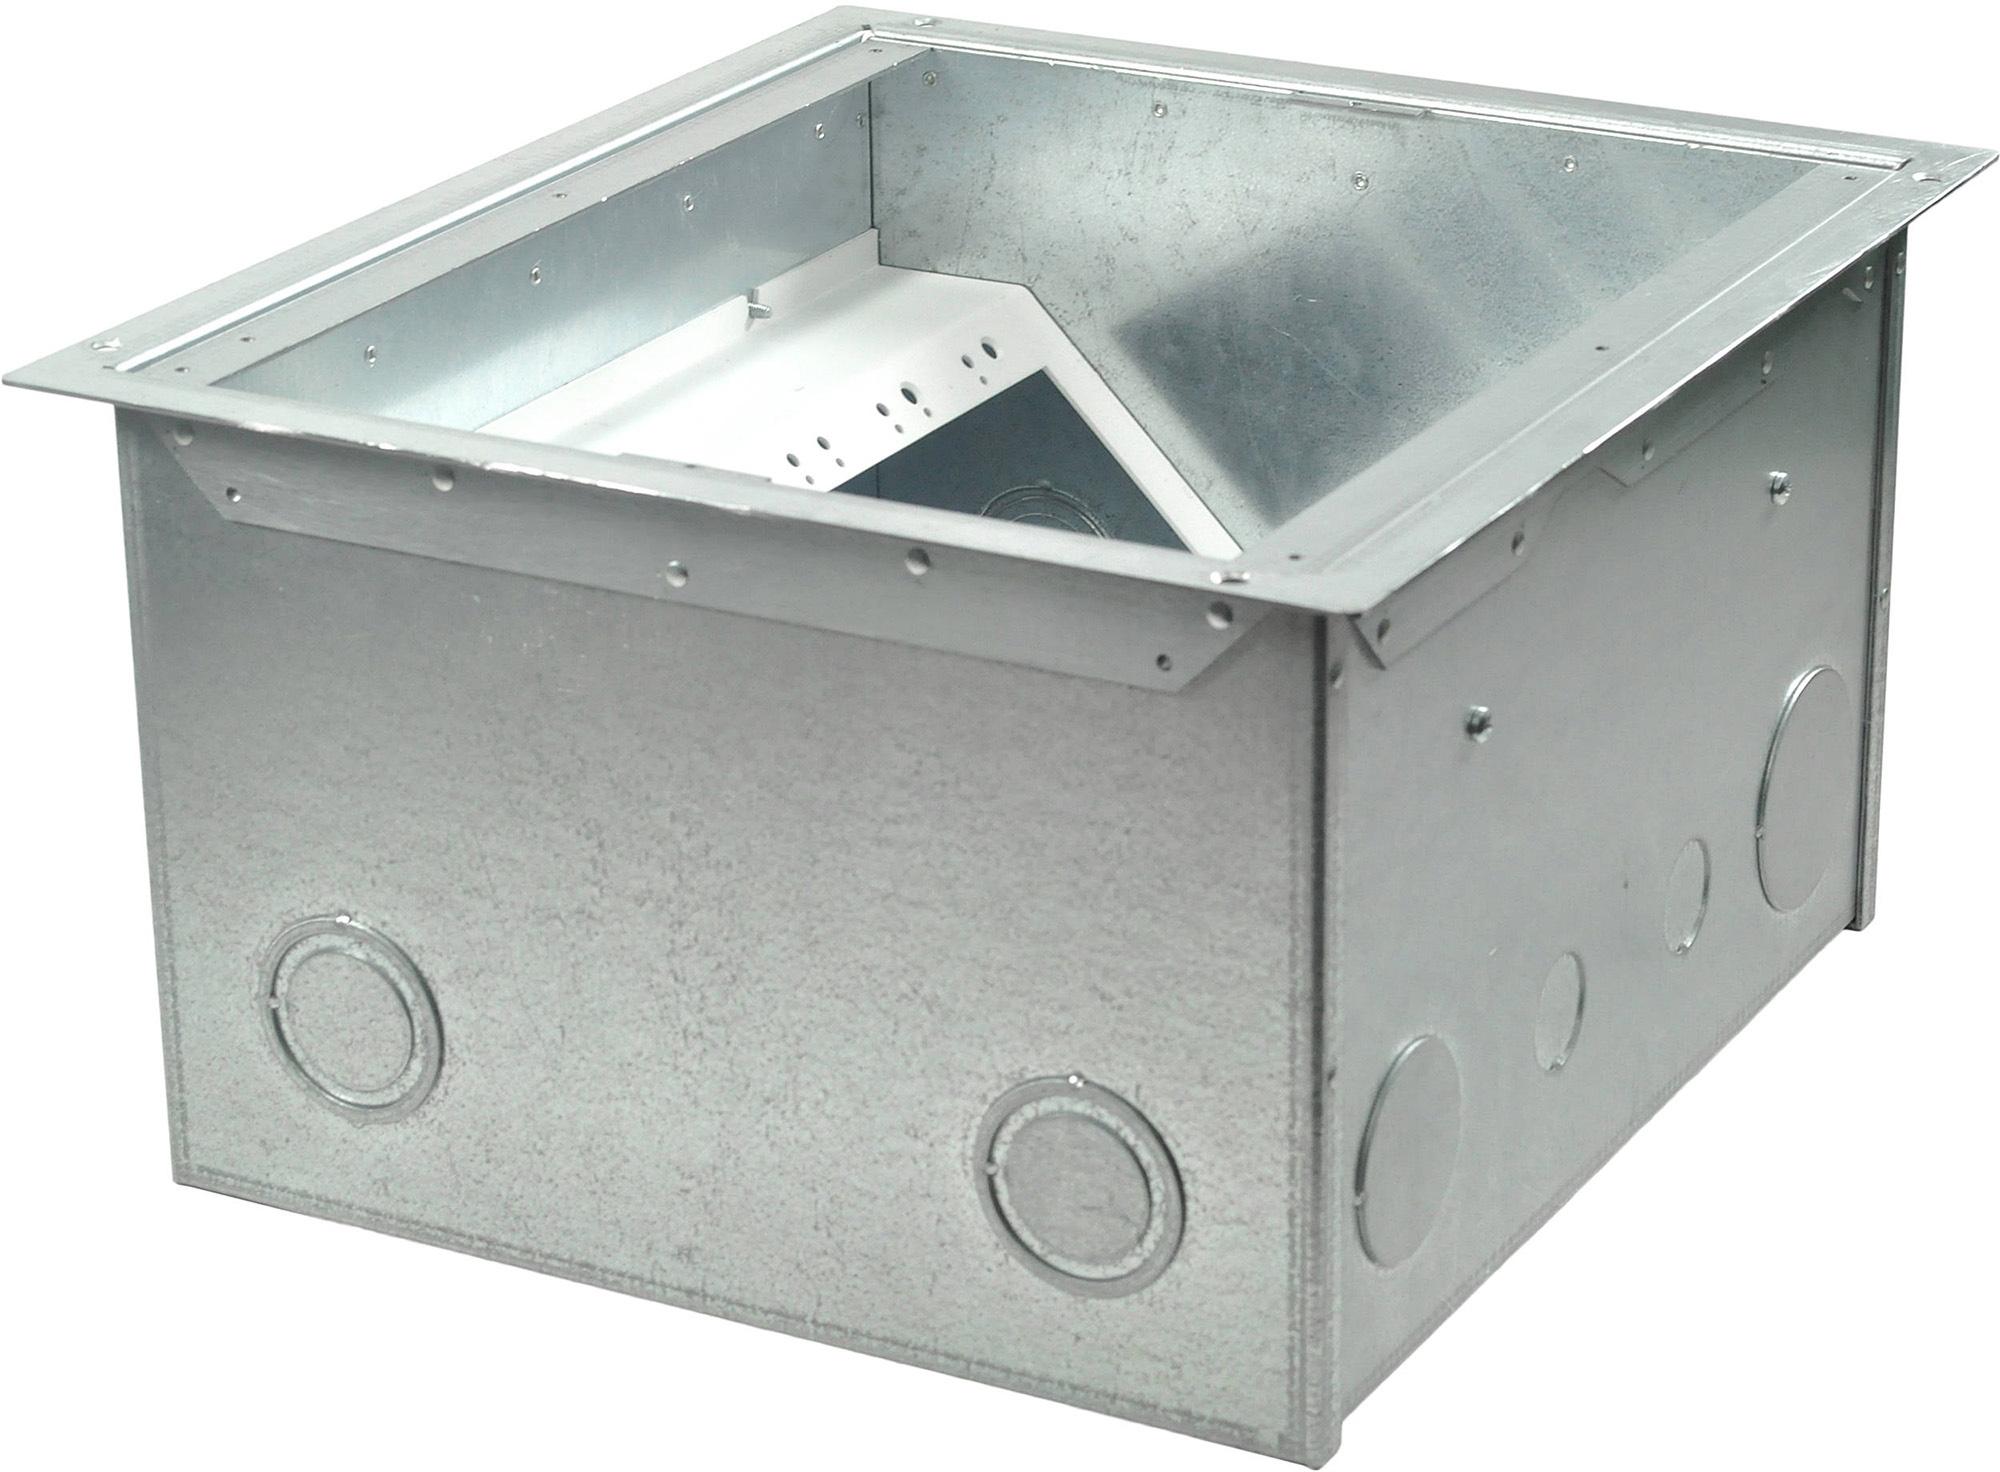 FSR FL-640P-8-B Back Box - 8 Inch Deep FSR-FL-640P-8-B